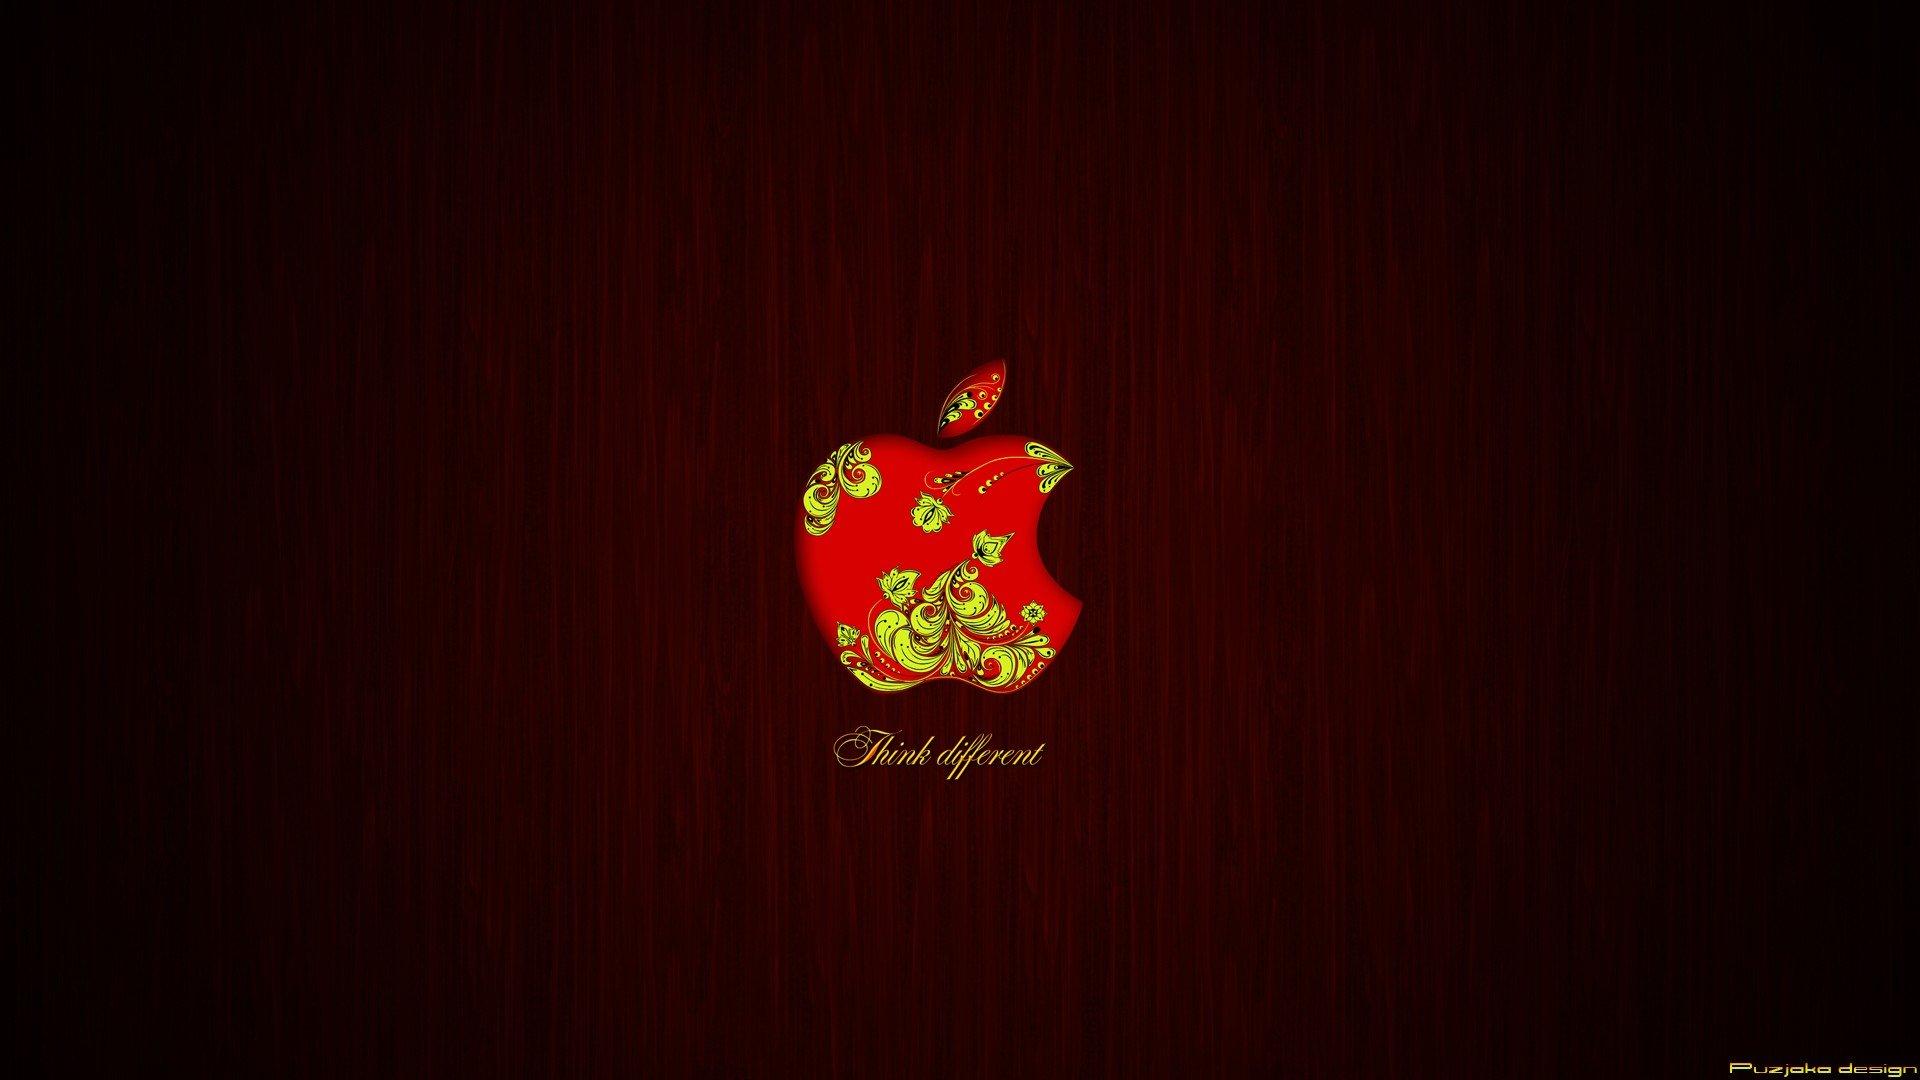 free download apple wallpaper id:296738 full hd 1920x1080 for pc